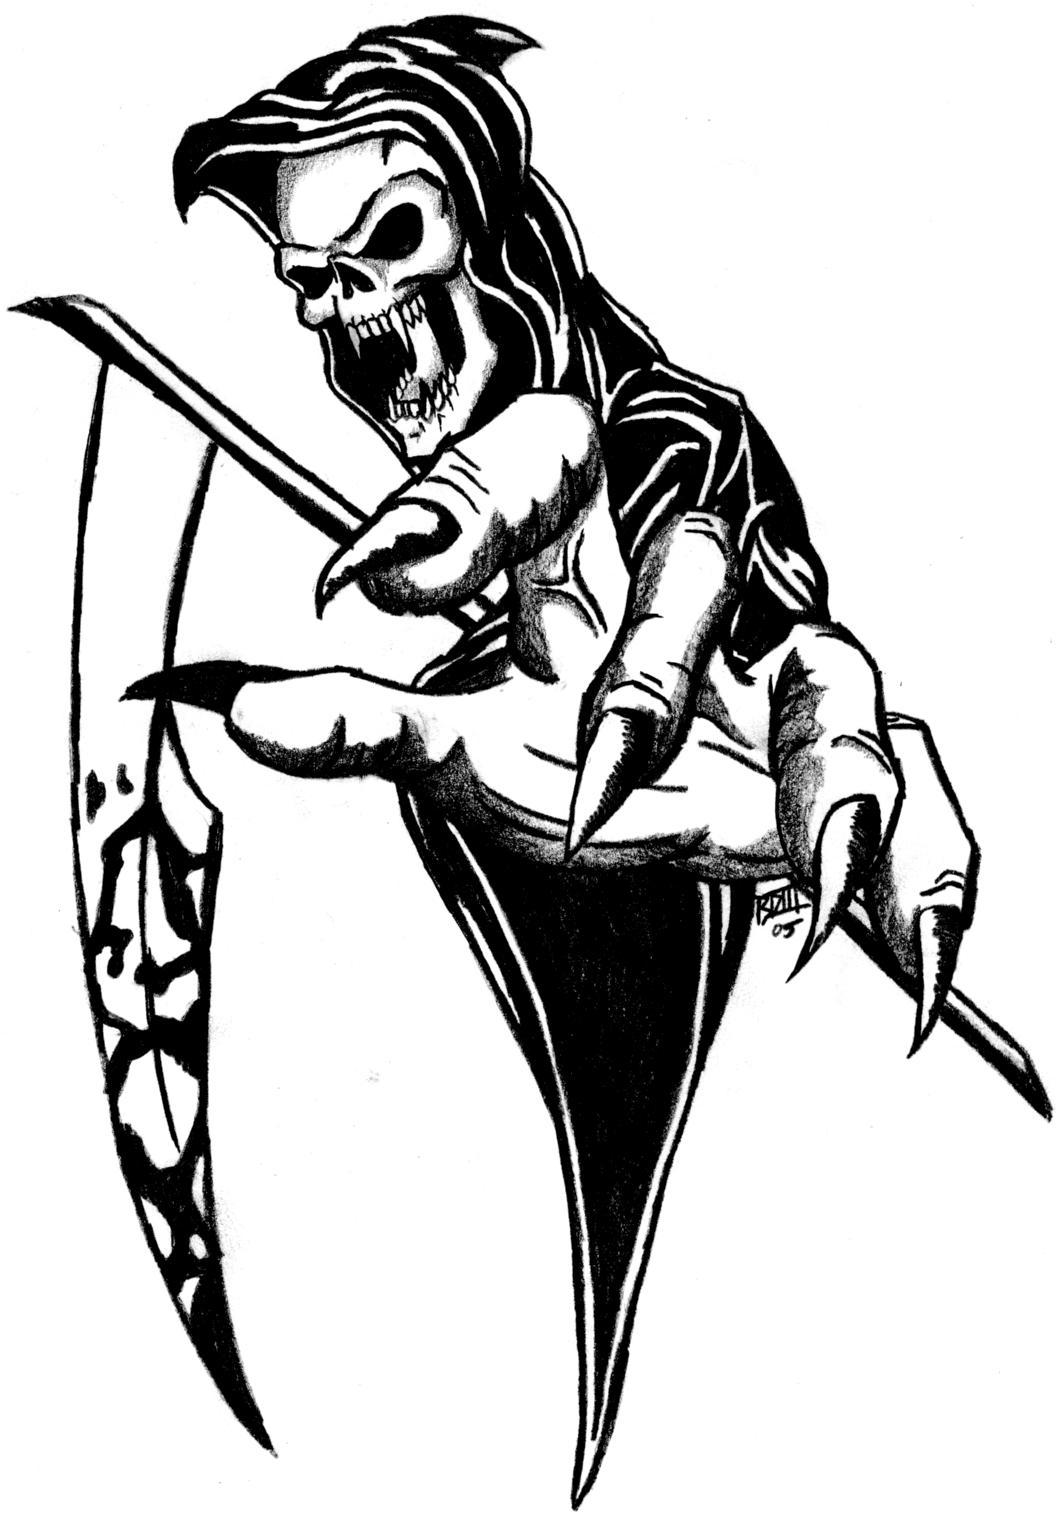 Drawn grim reaper hand sketch Grim Grim Reaper BD3illustrations by